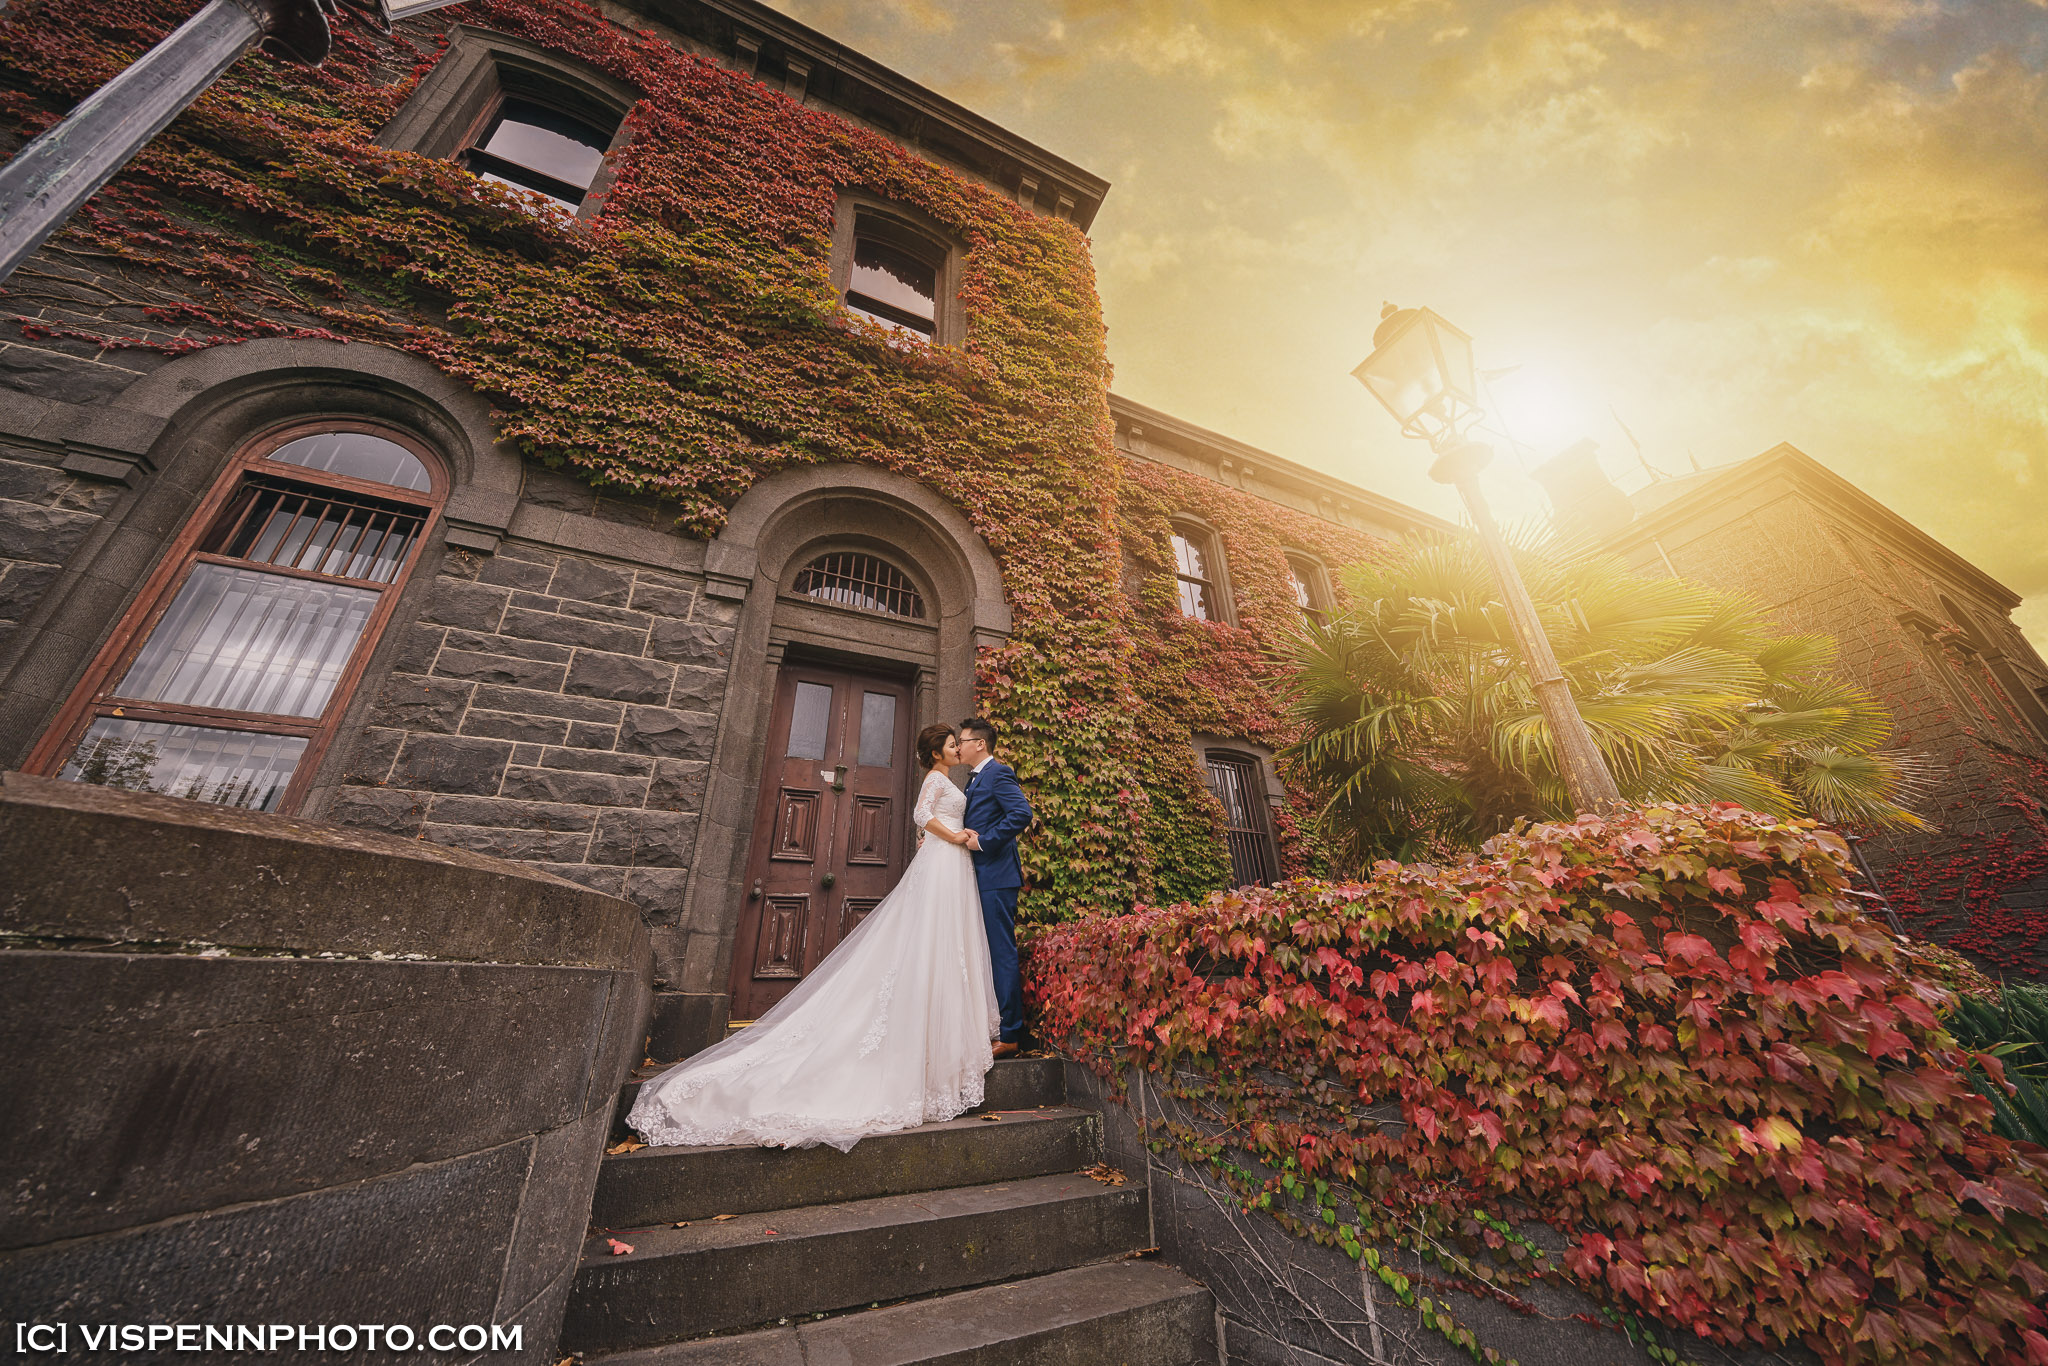 PRE WEDDING Photography Melbourne VISPENN 墨尔本 婚纱照 结婚照 婚纱摄影 VISPENN AthenaXiao 0467 copy